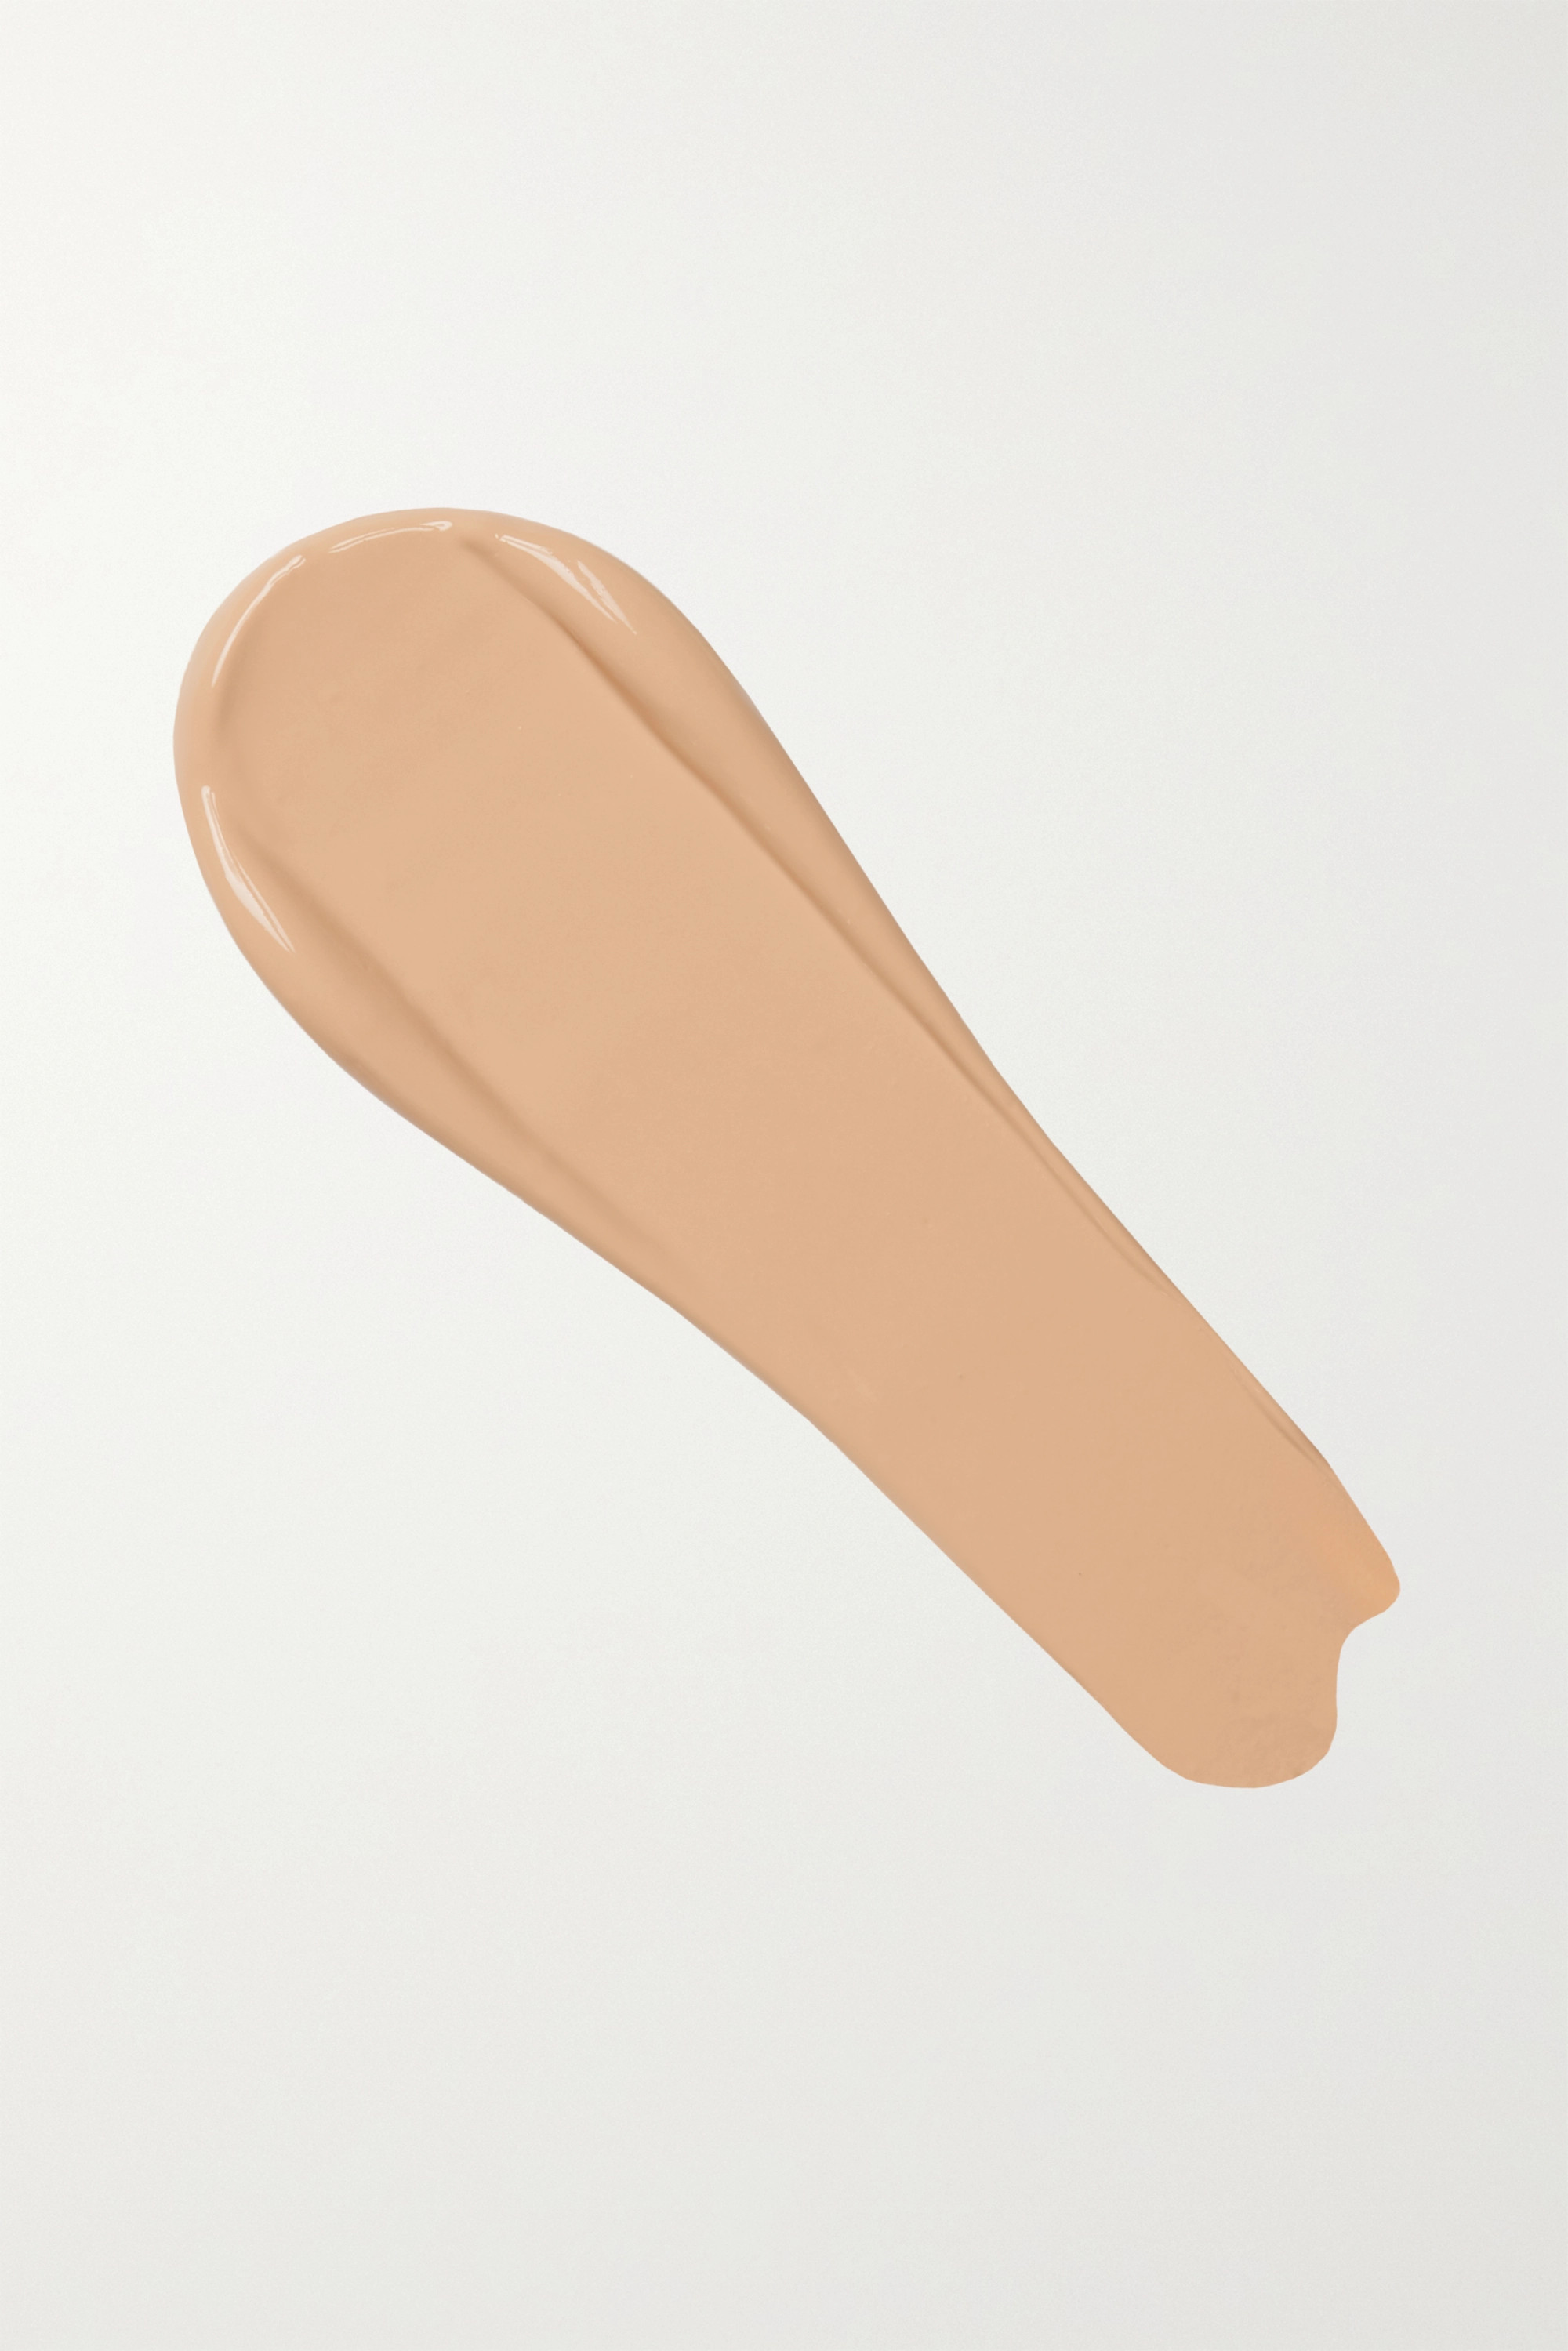 Pat McGrath Labs Skin Fetish: Sublime Perfection Concealer - L6, 5ml